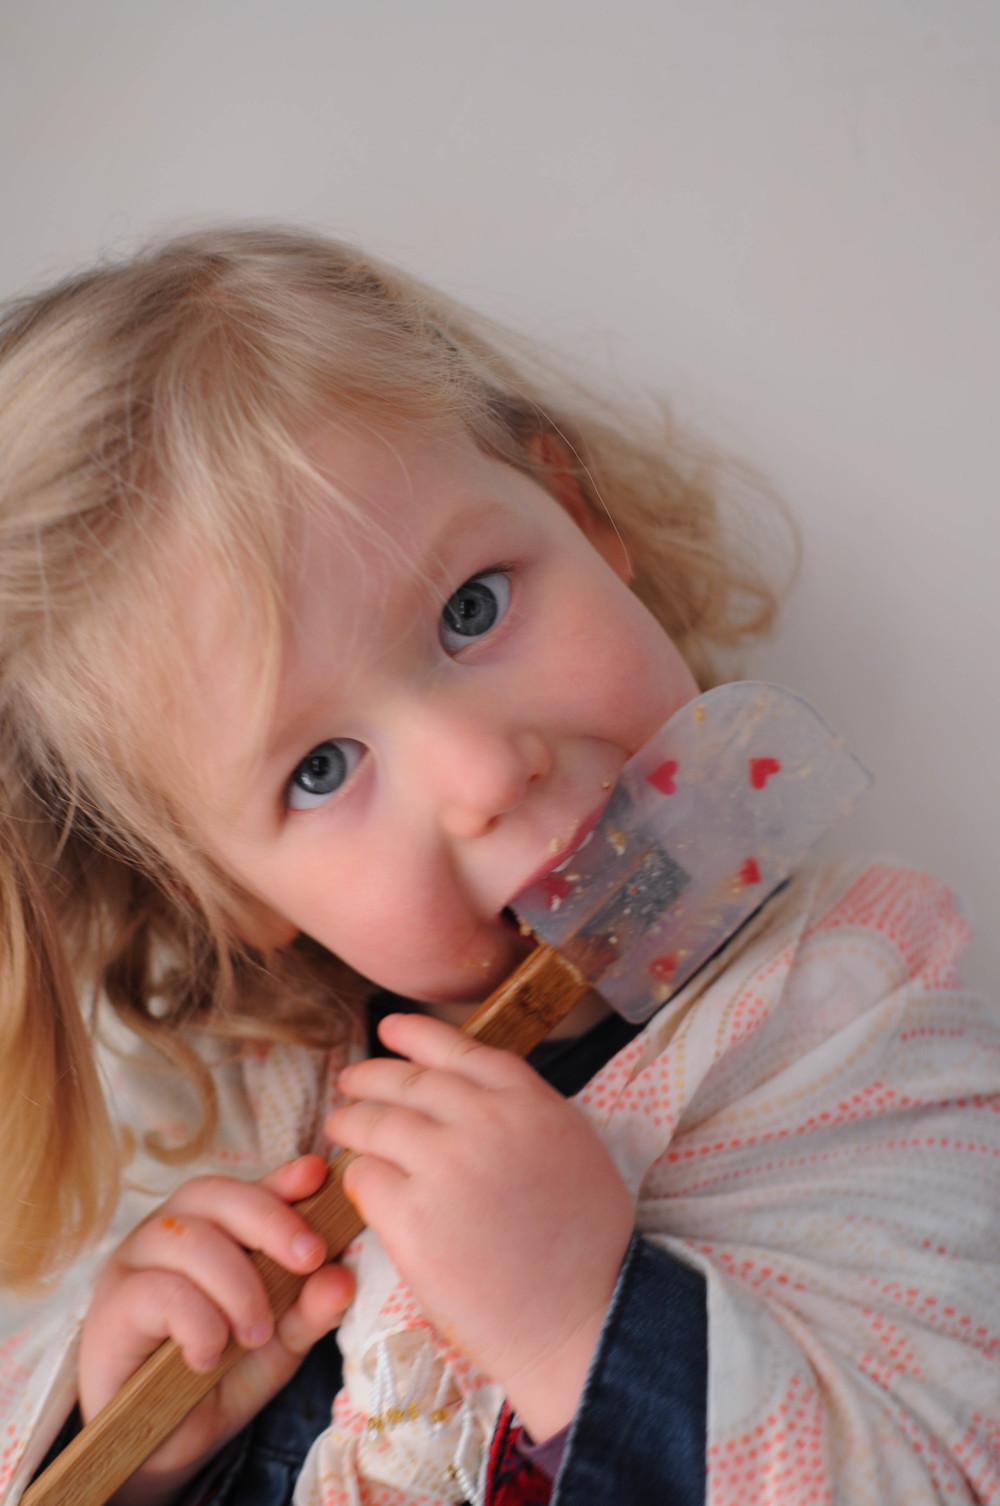 Little One Taste testing cookie recipe